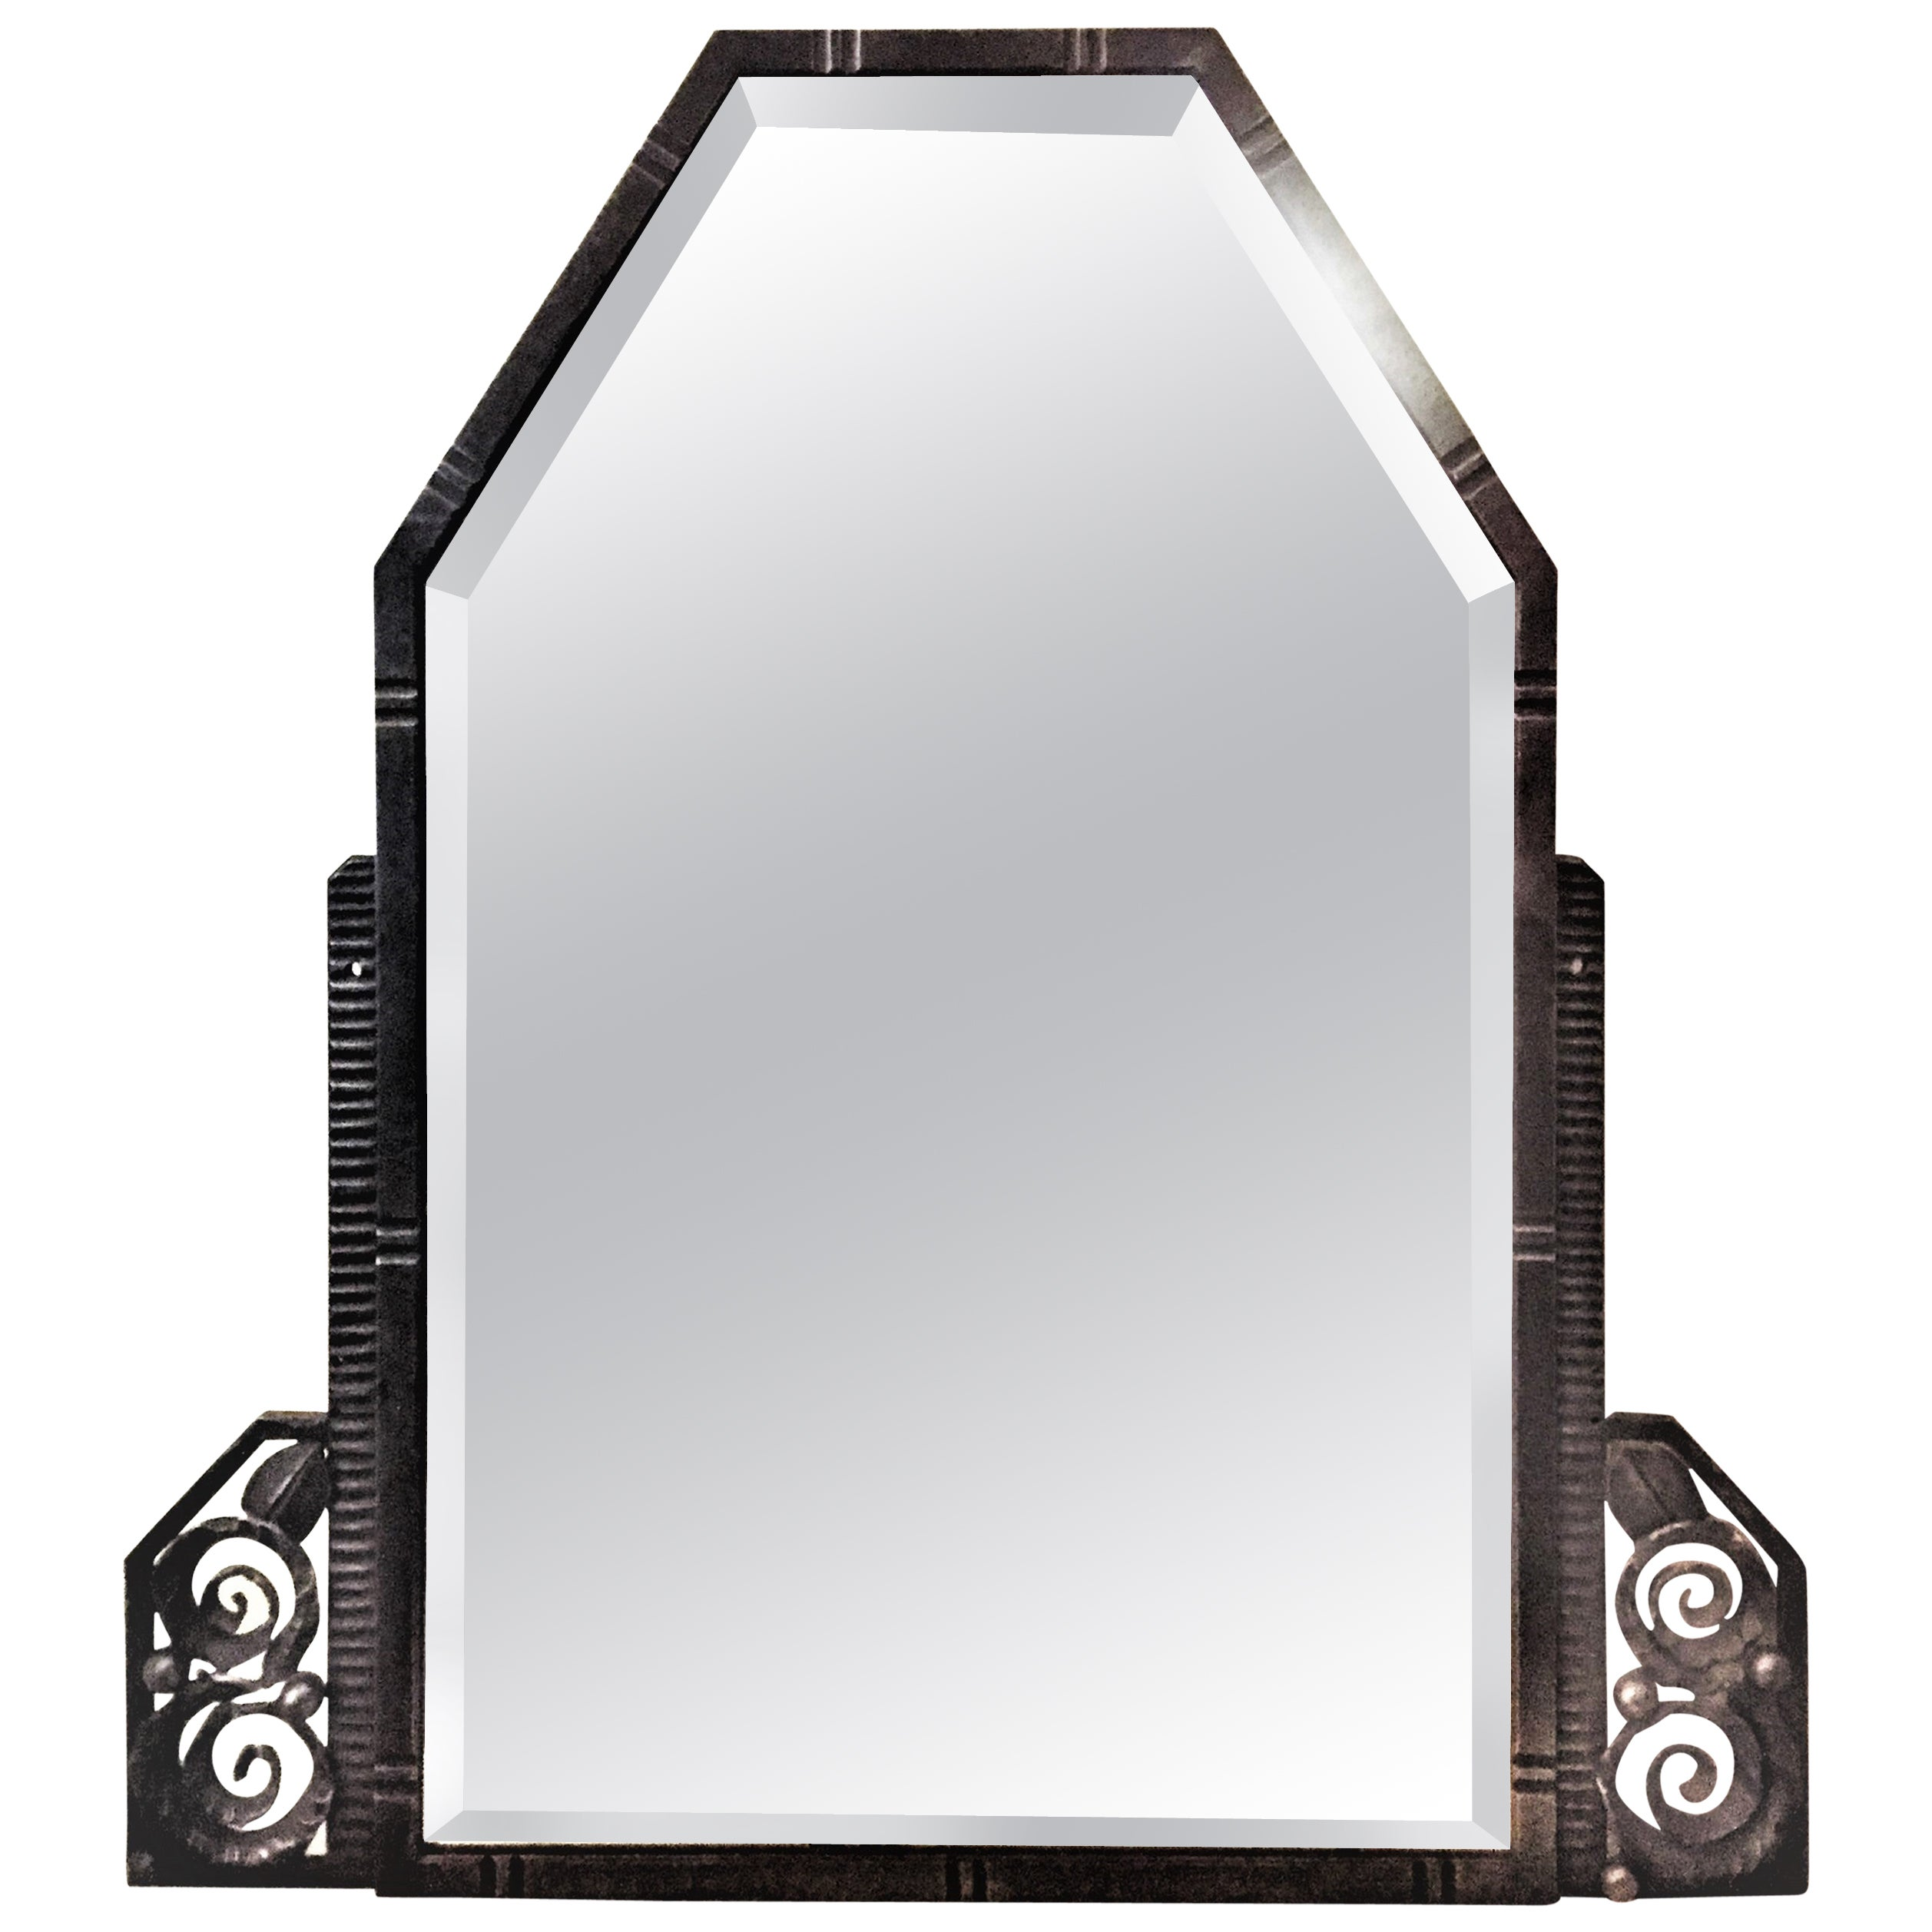 Art Deco Wrought Iron Wall Mirror, signed A. Valentin, circa 1920s